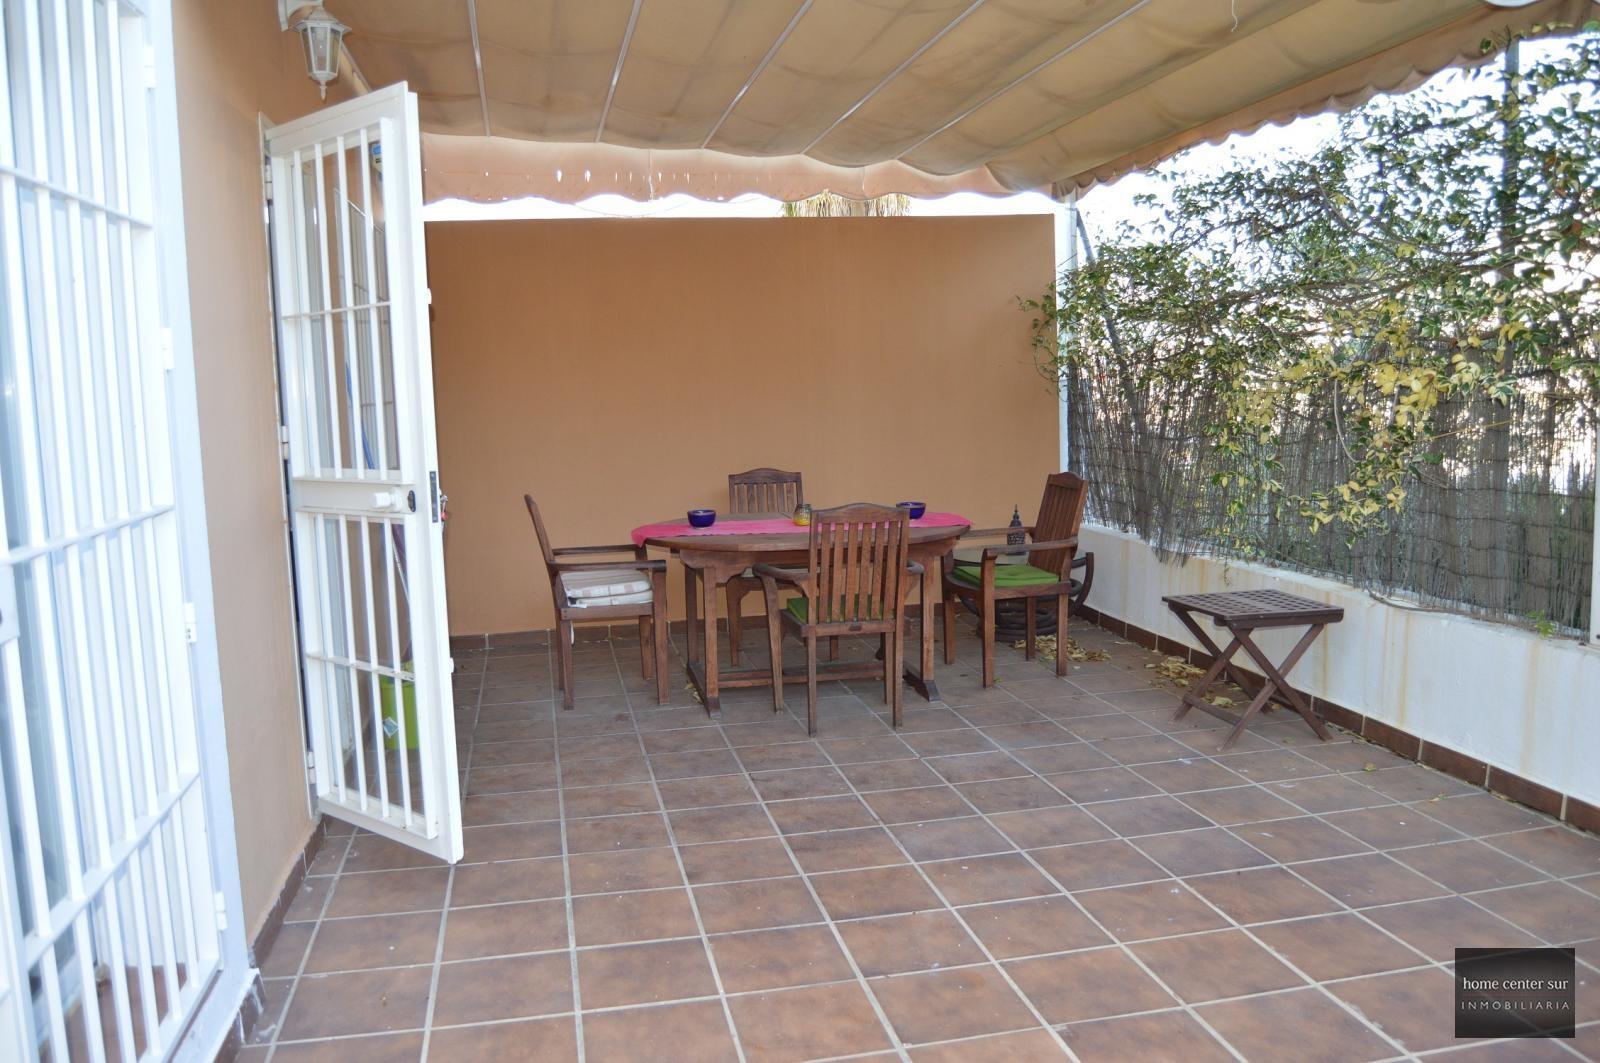 Casa en alquiler en Avenida Mare Nostrum (Fuengirola), 1.500 €/mes